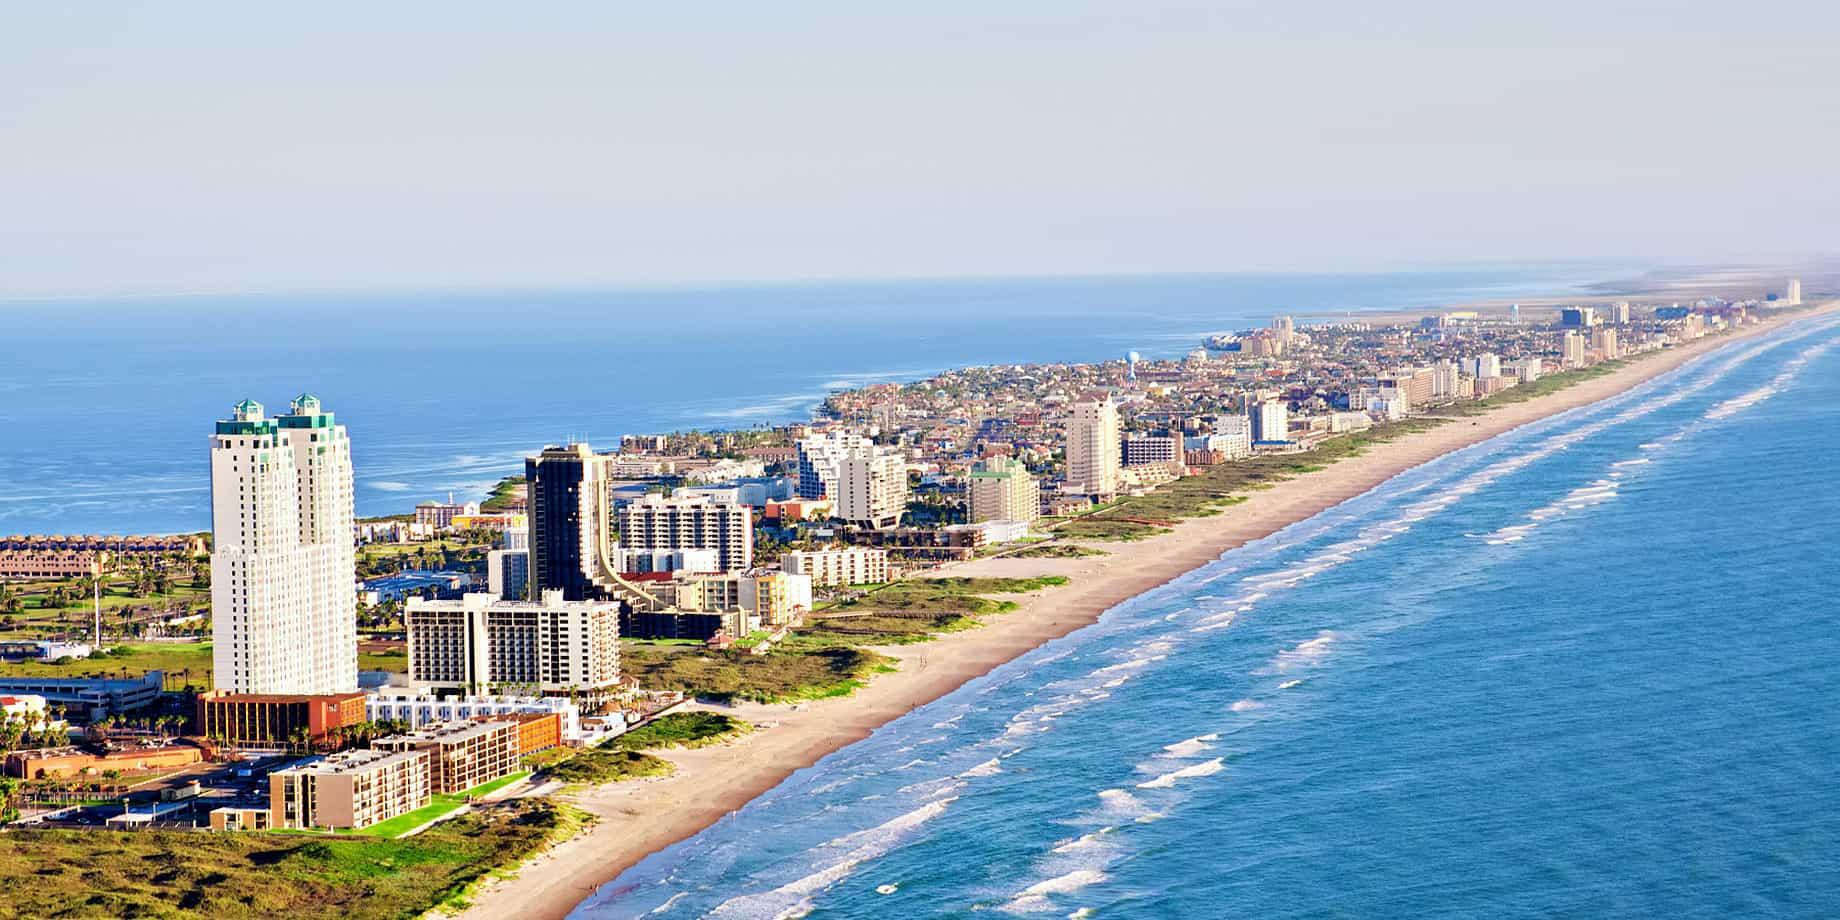 Corpus Christi Gay Bars and Hotels